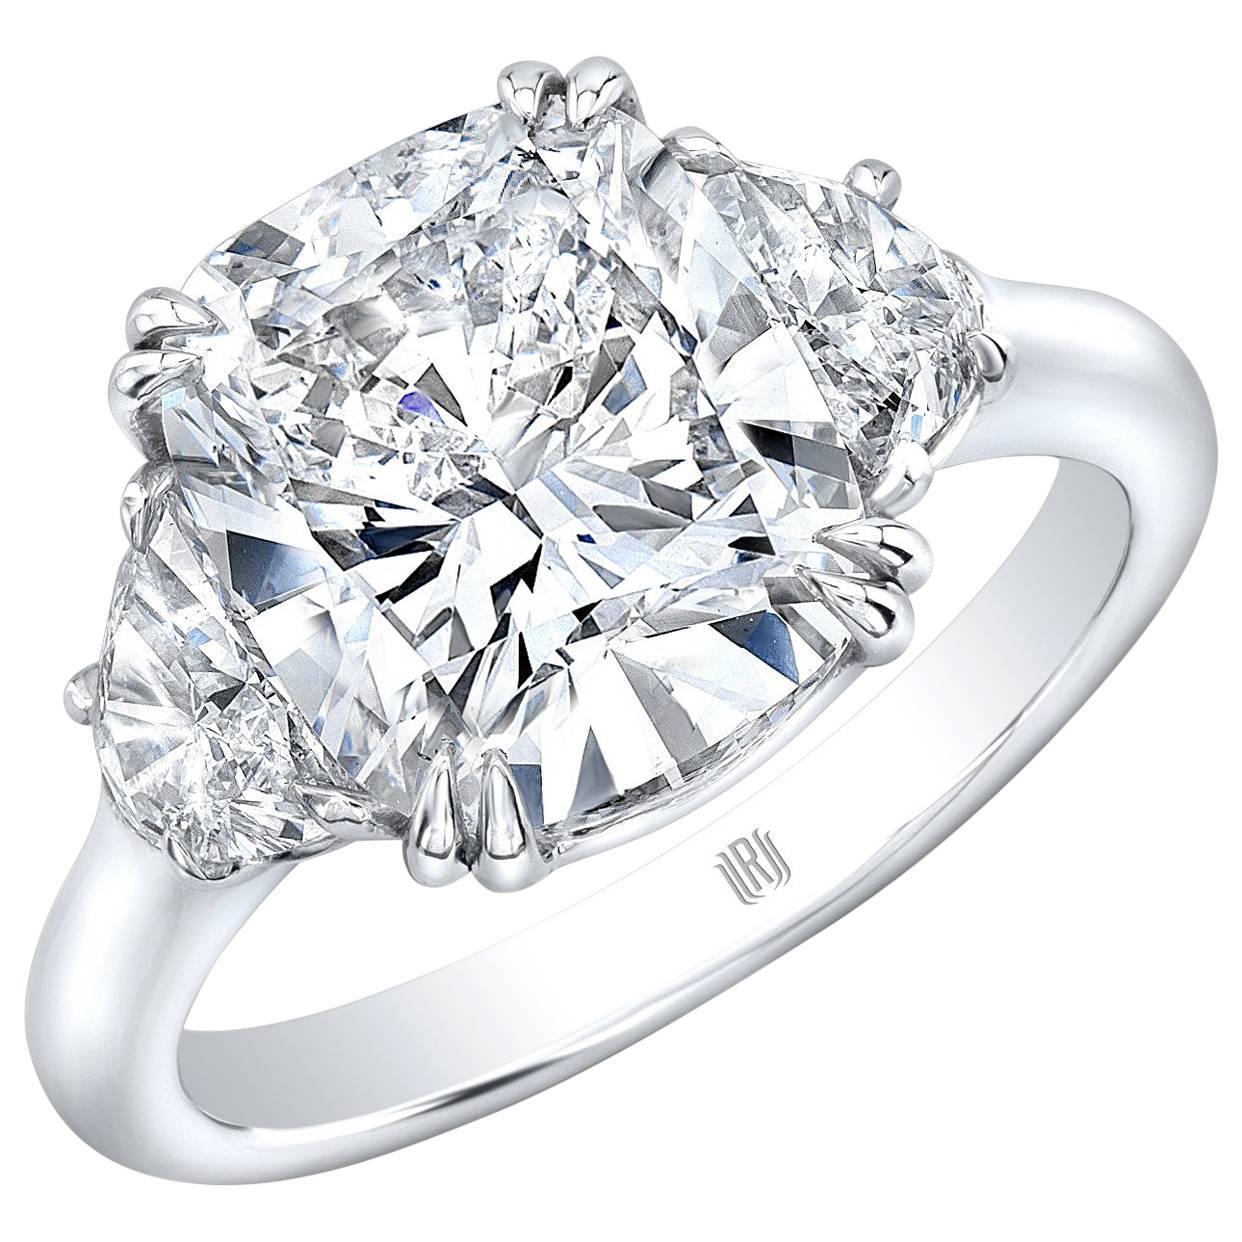 4 01 Carat GIA Cert G SI2 Cushion Cut Diamond Platinum Ring For Sale at 1stdibs